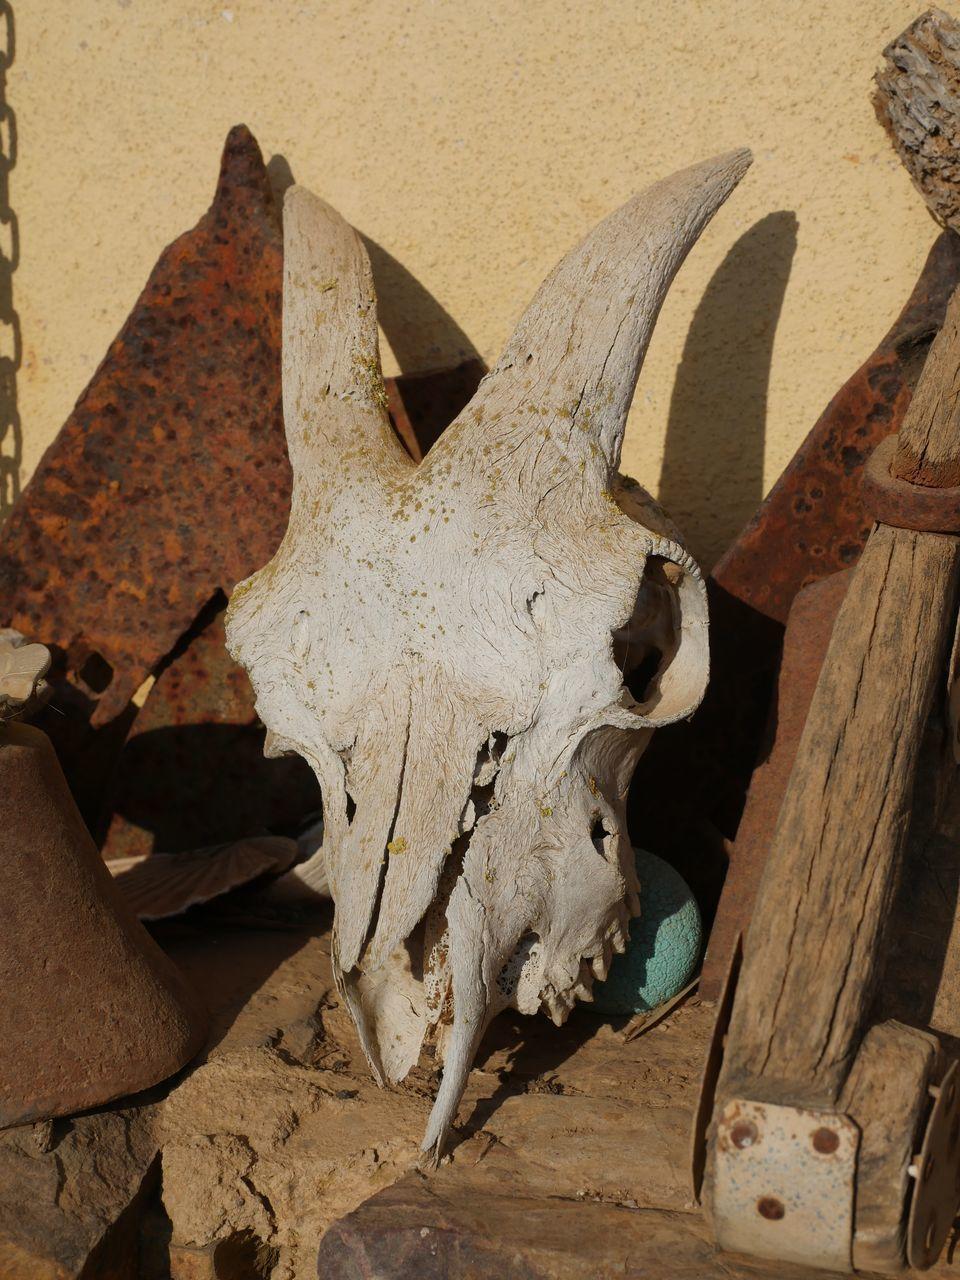 bone, animal body part, animal skull, animal, no people, close-up, animal themes, animal wildlife, nature, animal bone, sunlight, day, wood - material, land, body part, tree, outdoors, still life